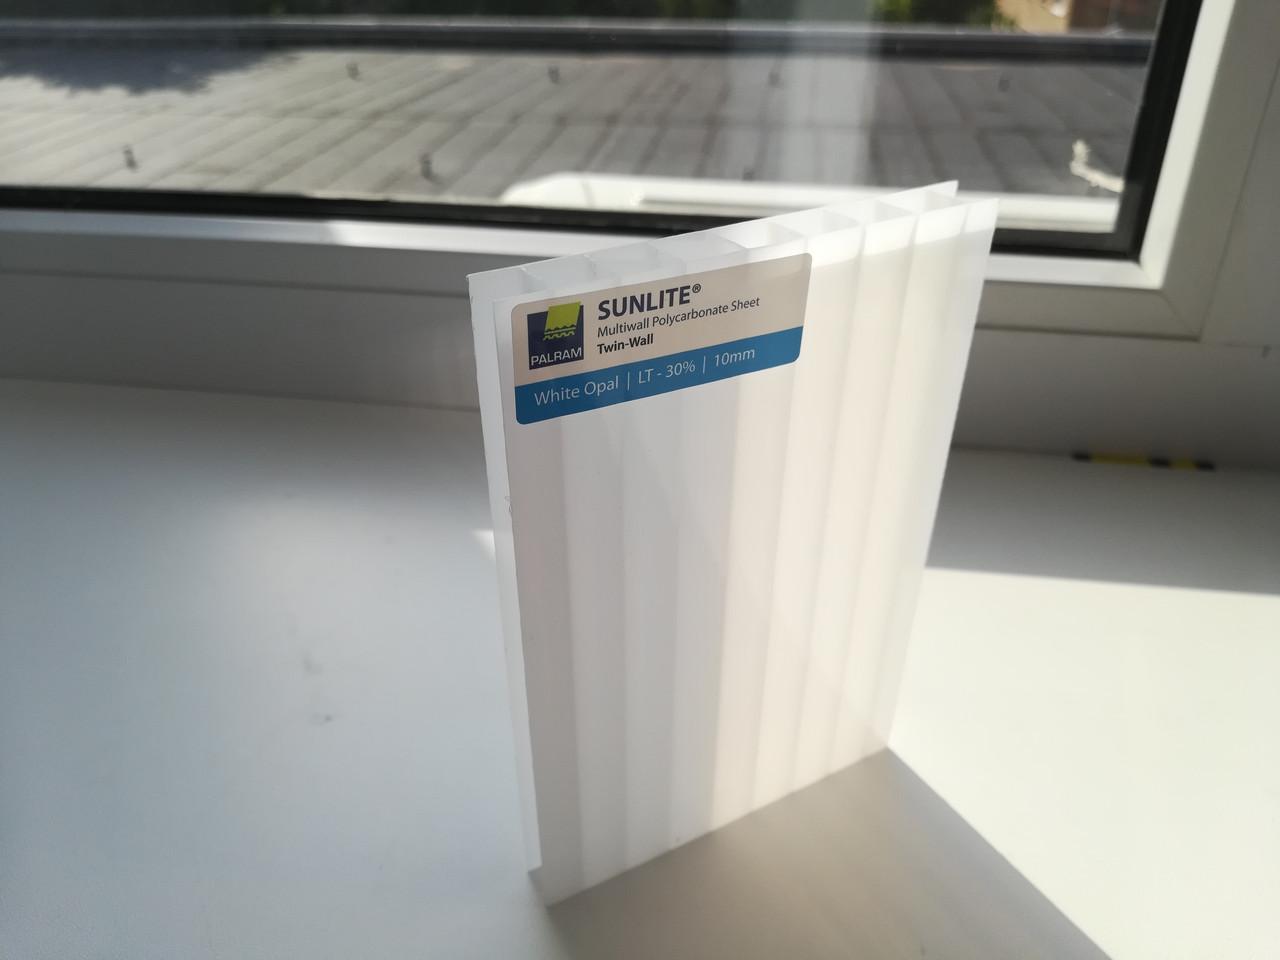 Поликарбонат сотовый SUNLITE Twin-Wall 6 mm White Opal